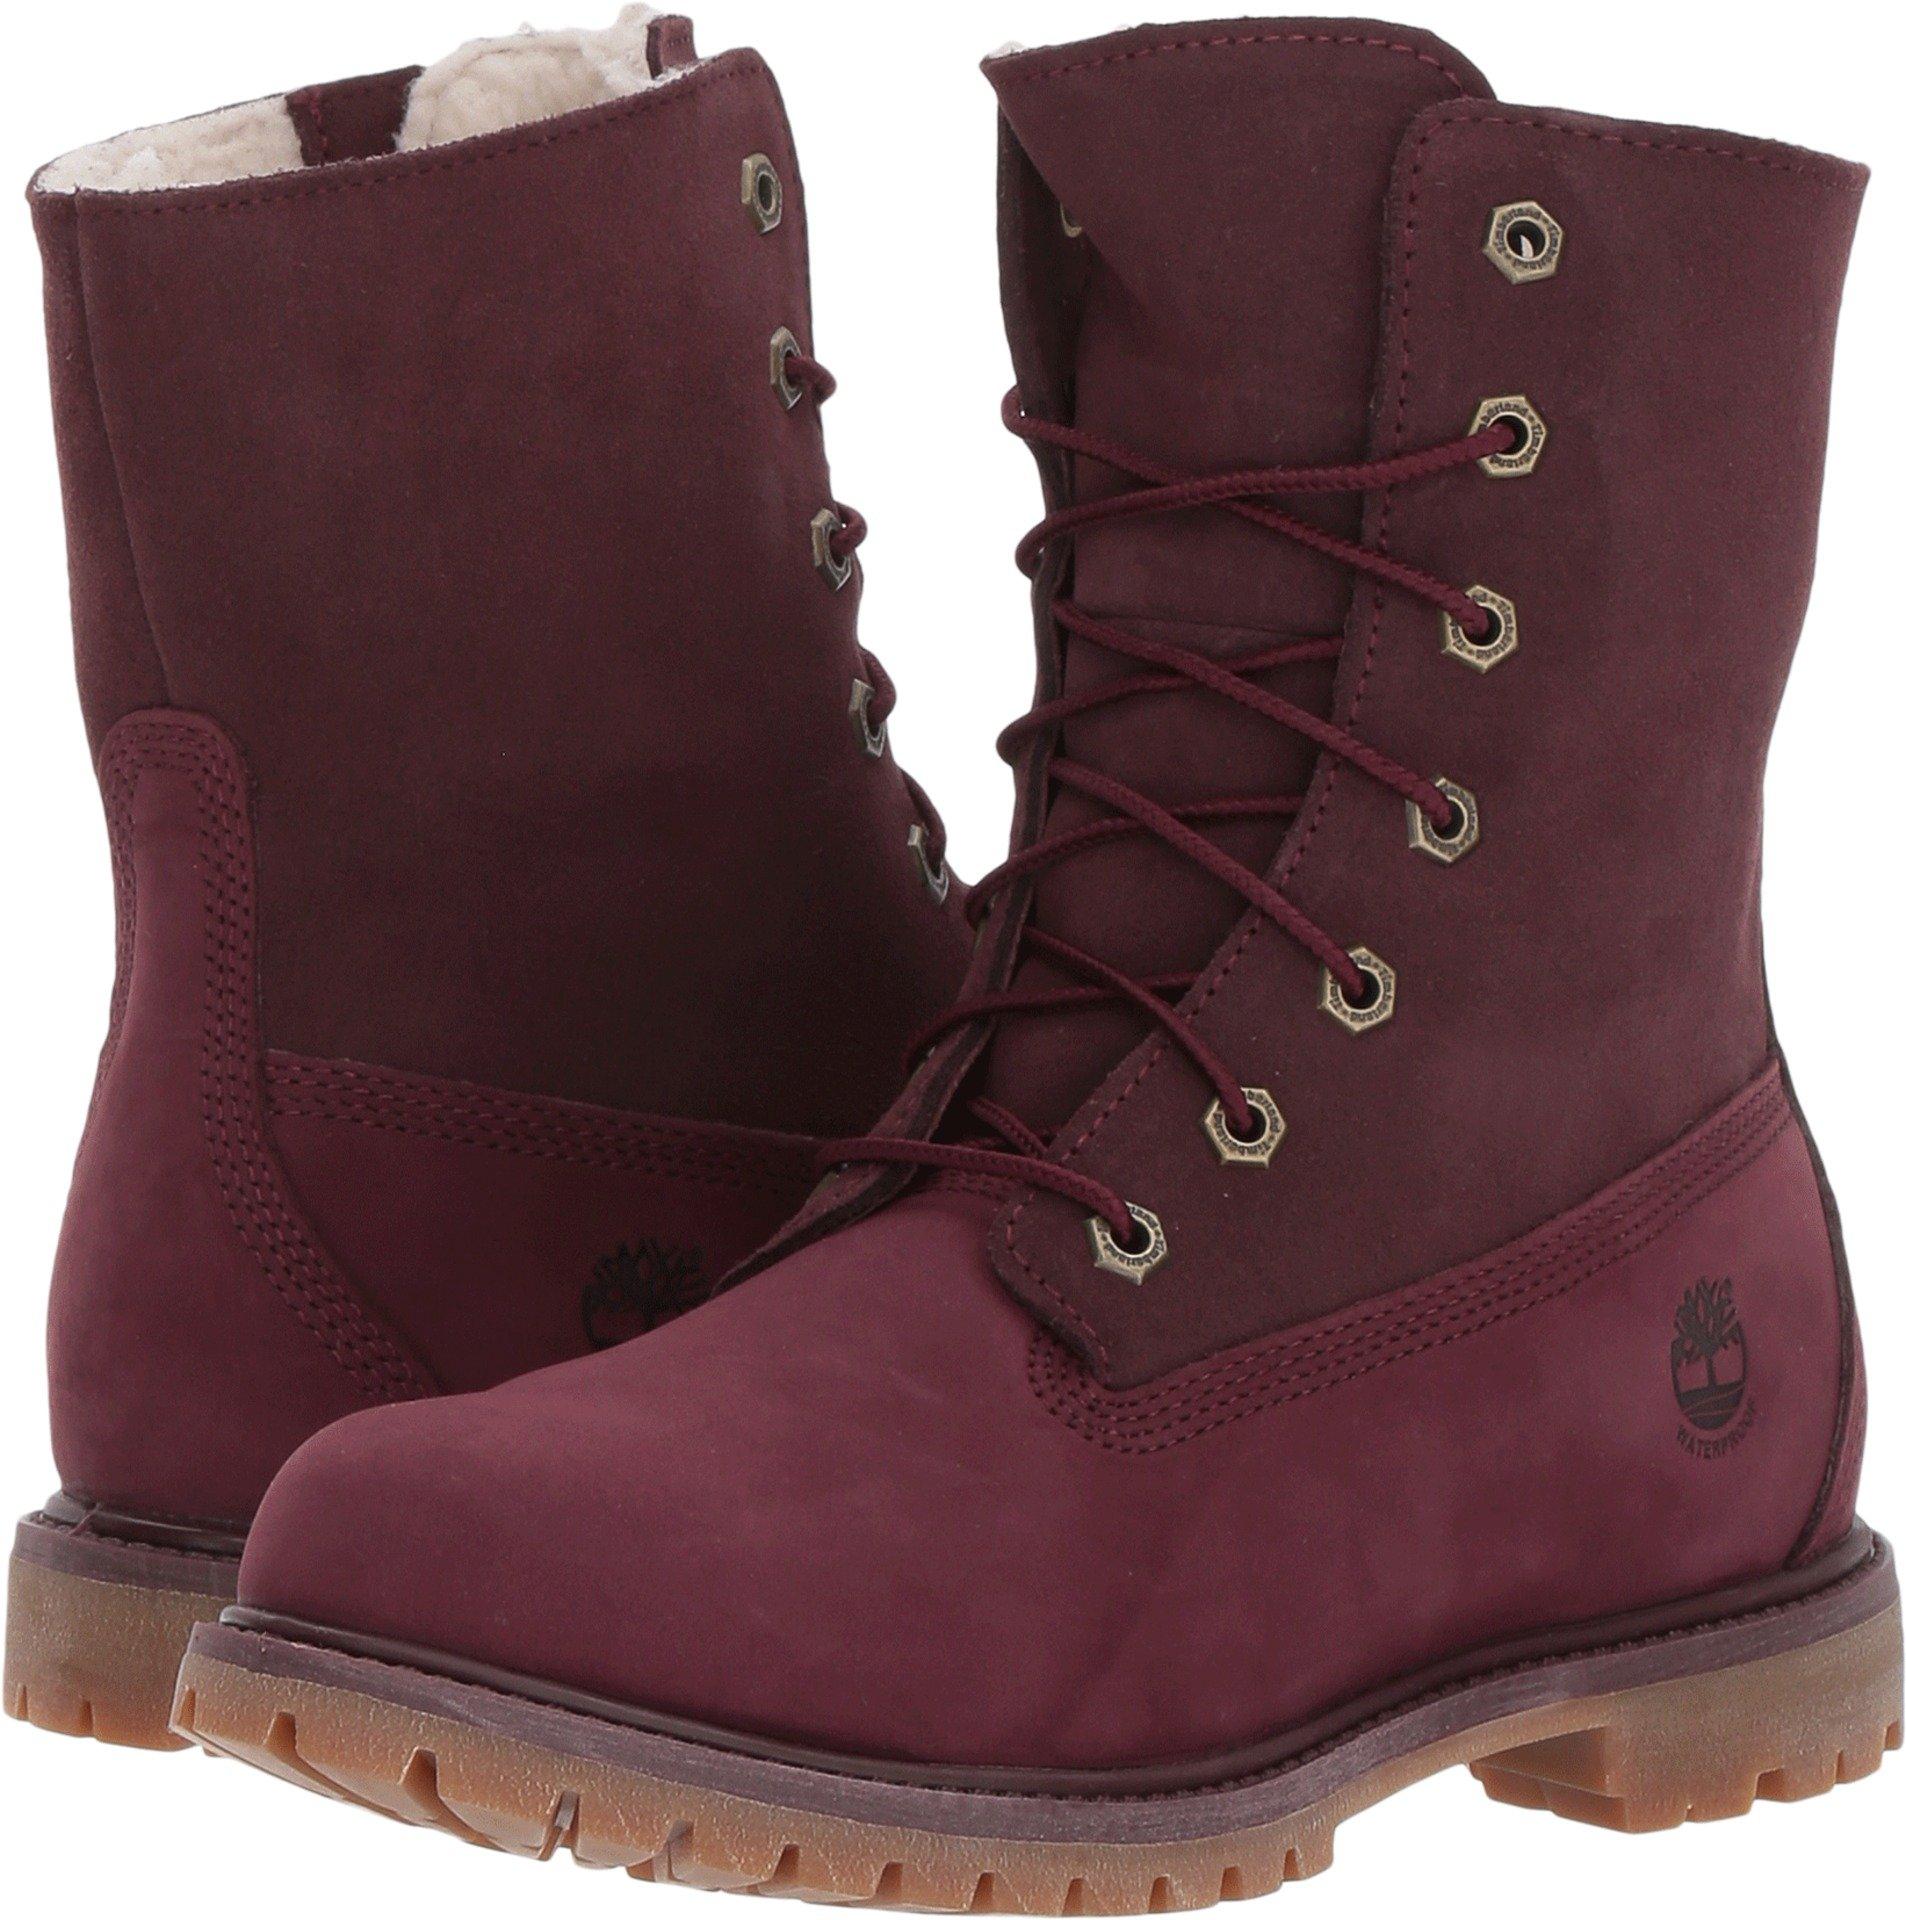 Timberland Womens Teddy Fleece Waterproof Boots, Red, 7.5 B(M) US